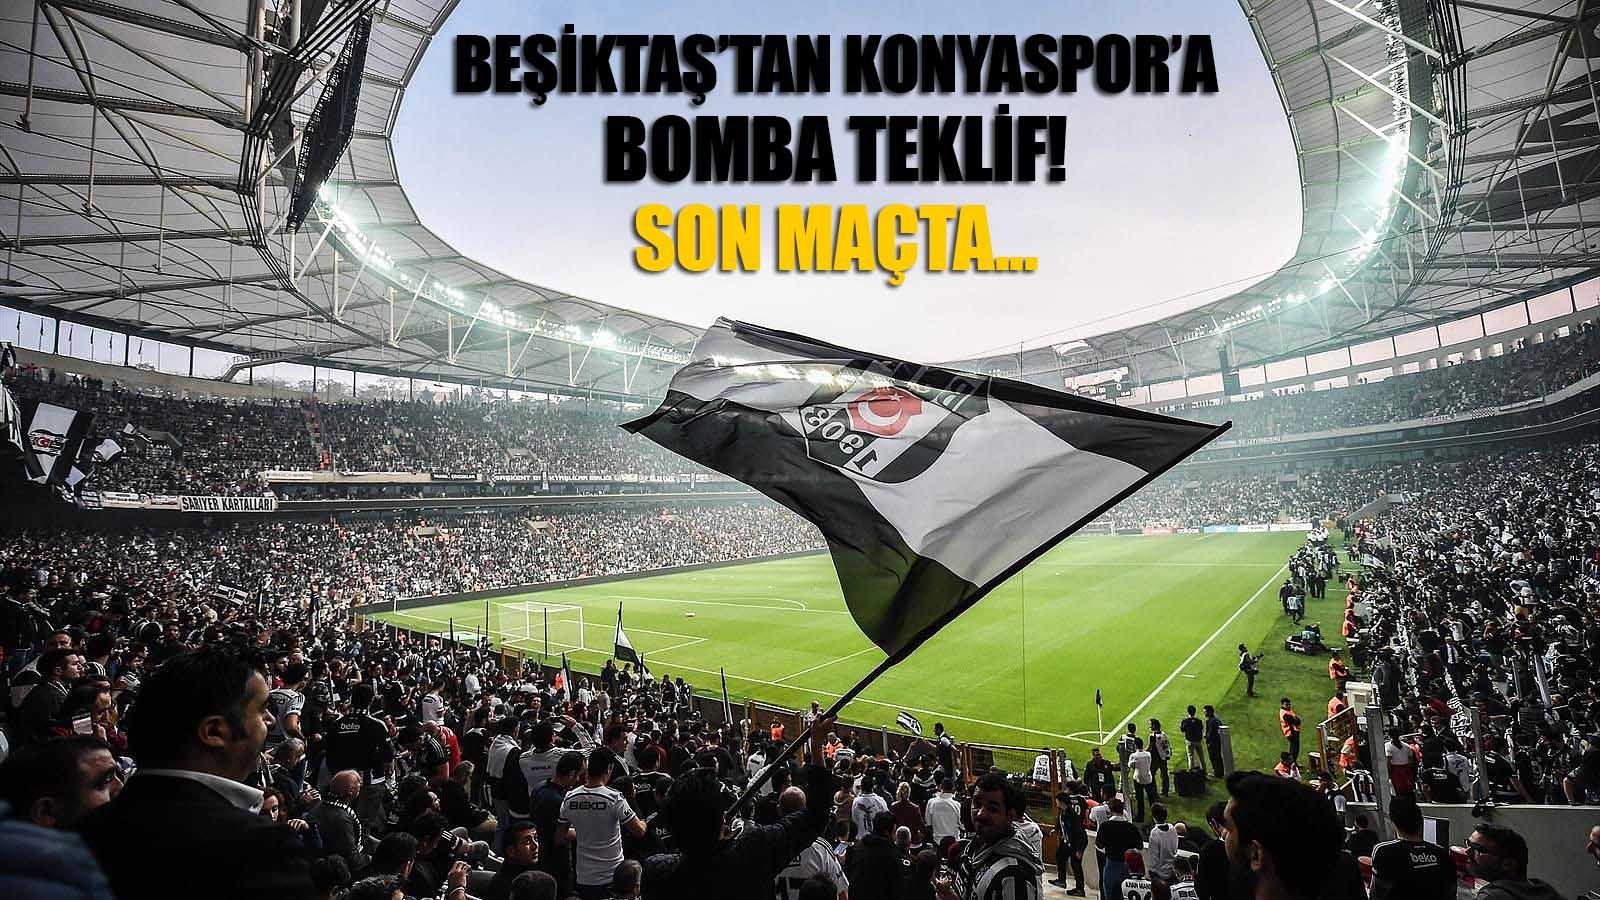 Beşiktaş'tan Konyaspor'a bomba teklif!